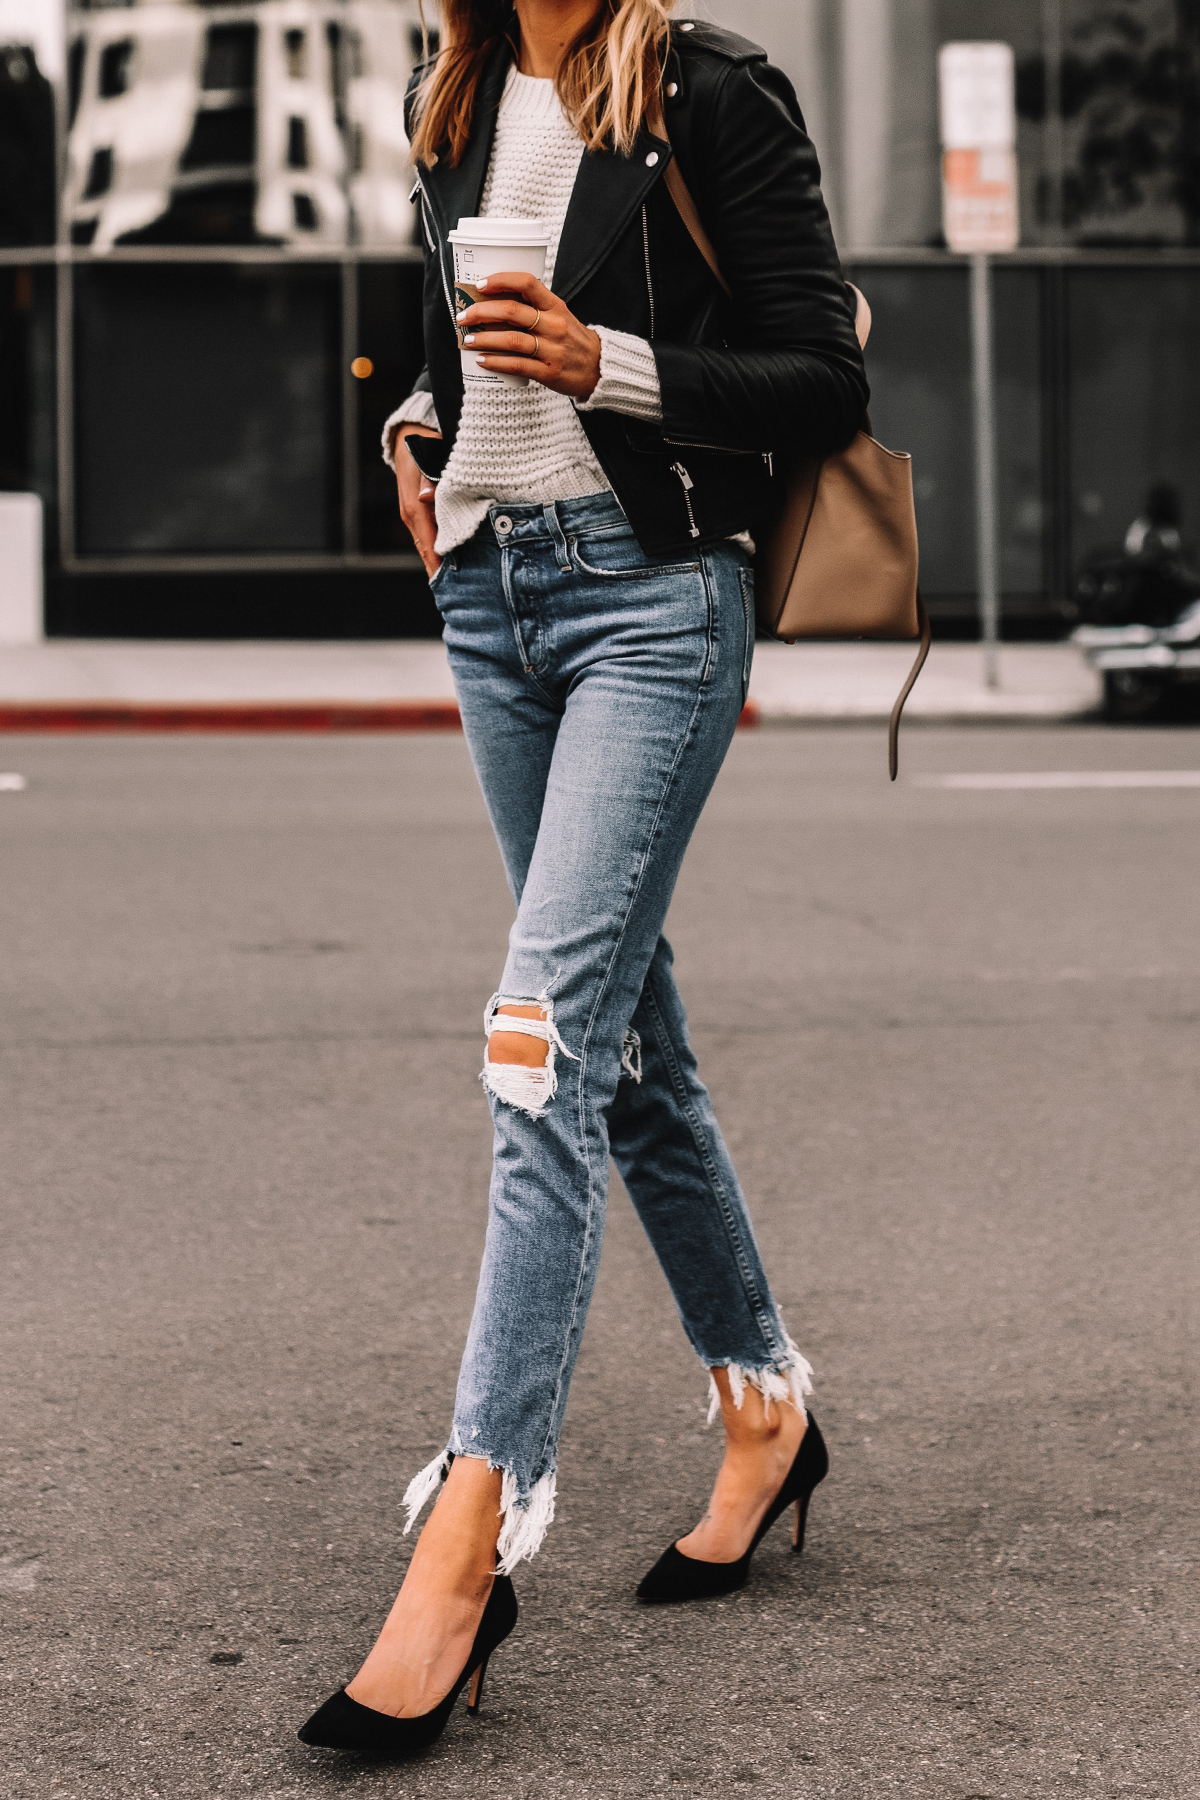 Fashion Jackson Wearing Black Leather Jacket White Sweater Ripped Jeans Black Pumps